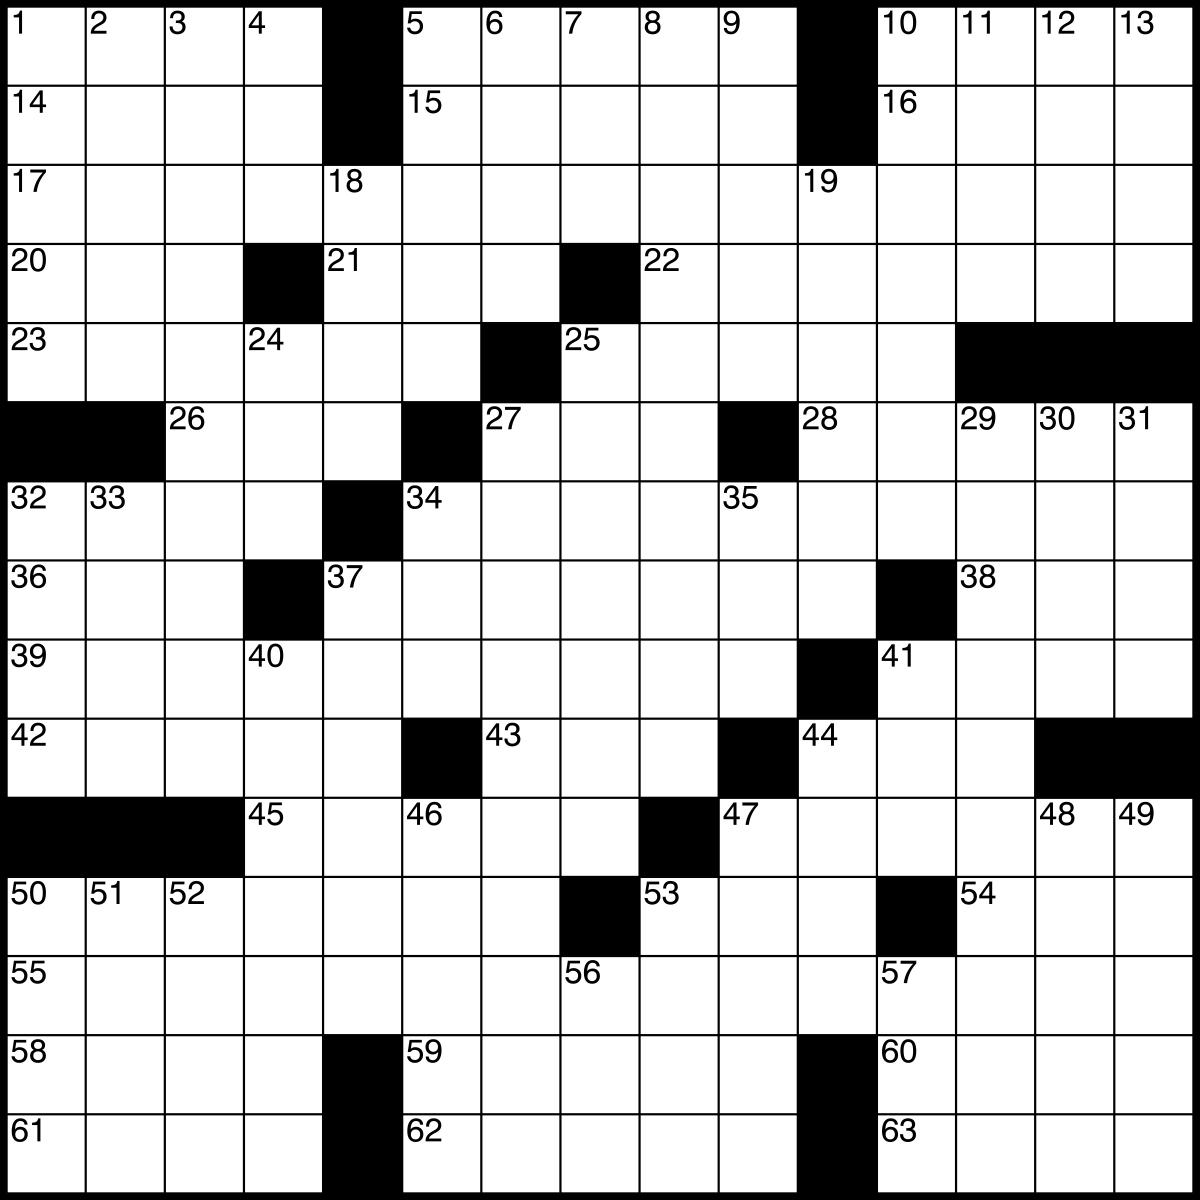 017 Essay Example Name In Essays Crossword Clue 1200px Crosswordusa Excellent Full